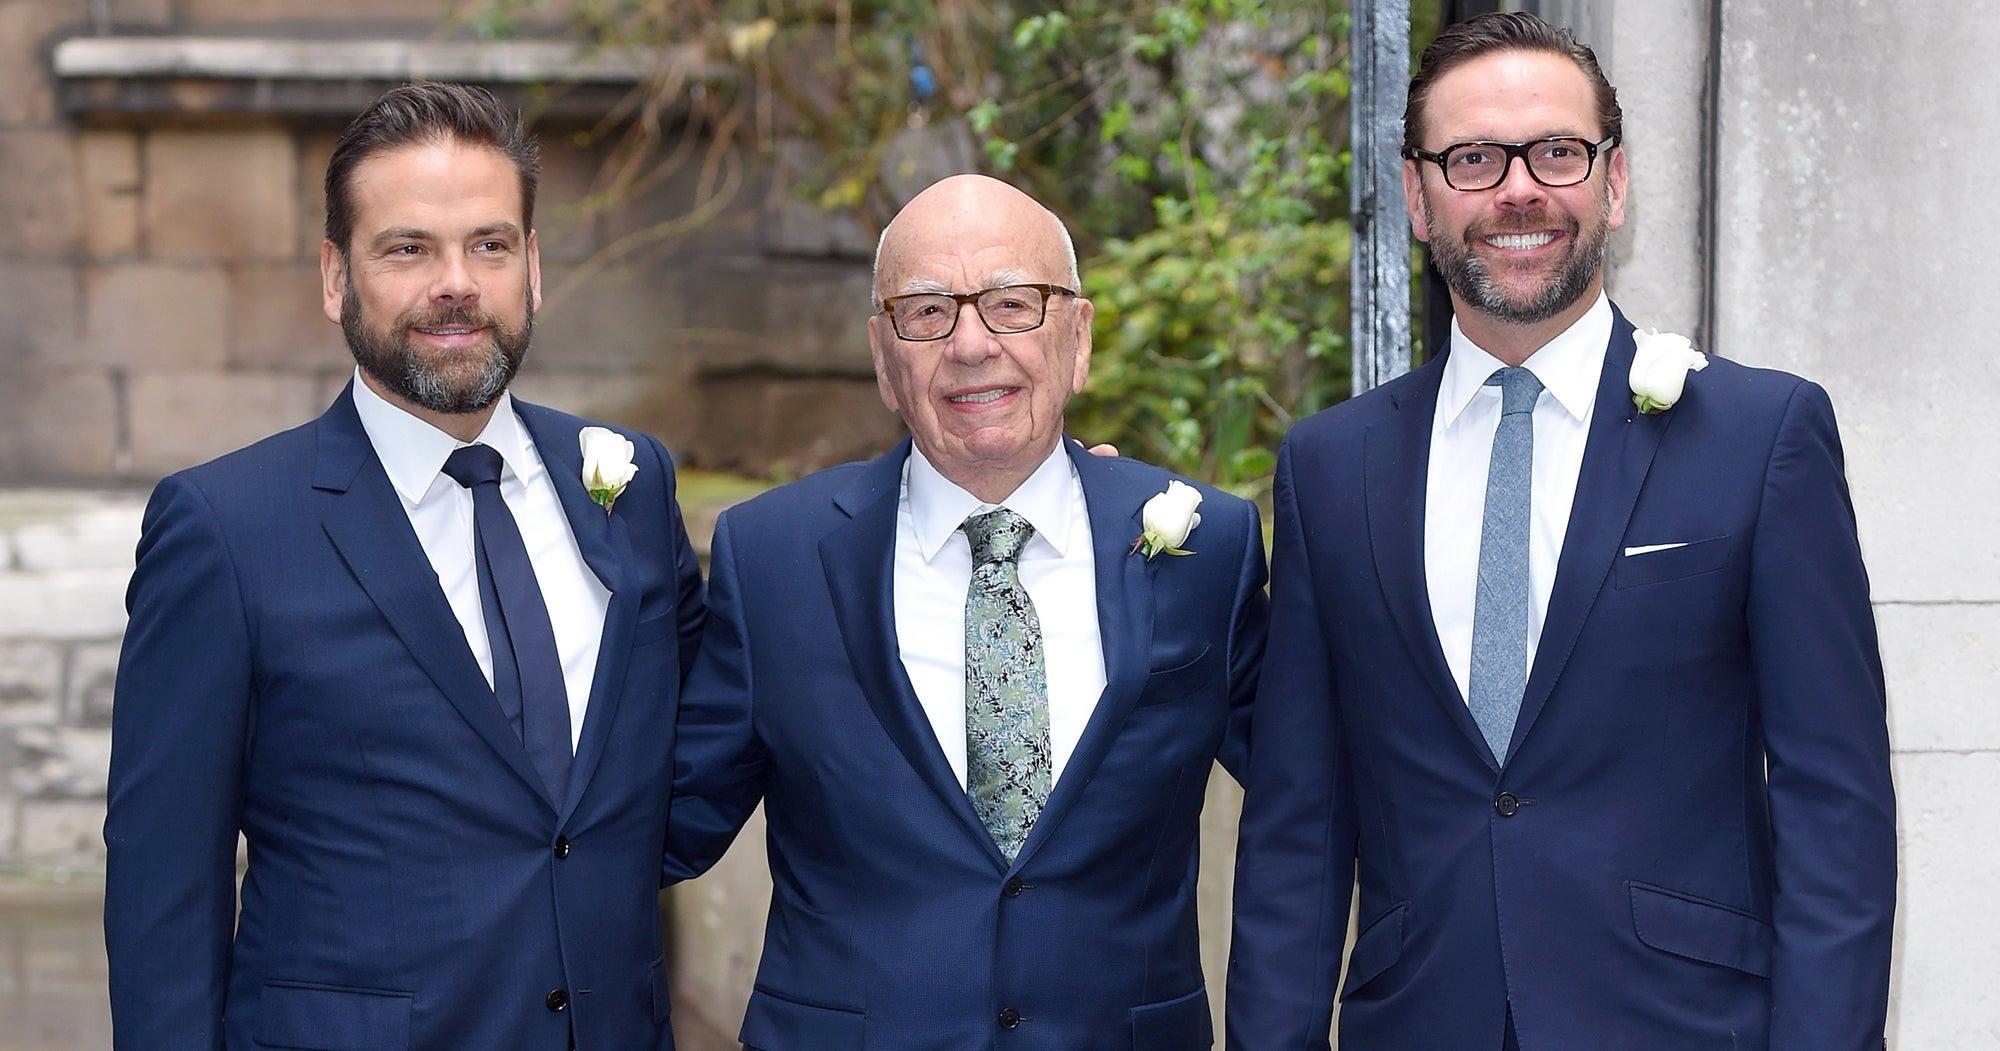 Are Australians being censored from seeing new BBC documentary on Murdoch empire? | TV Blackbox